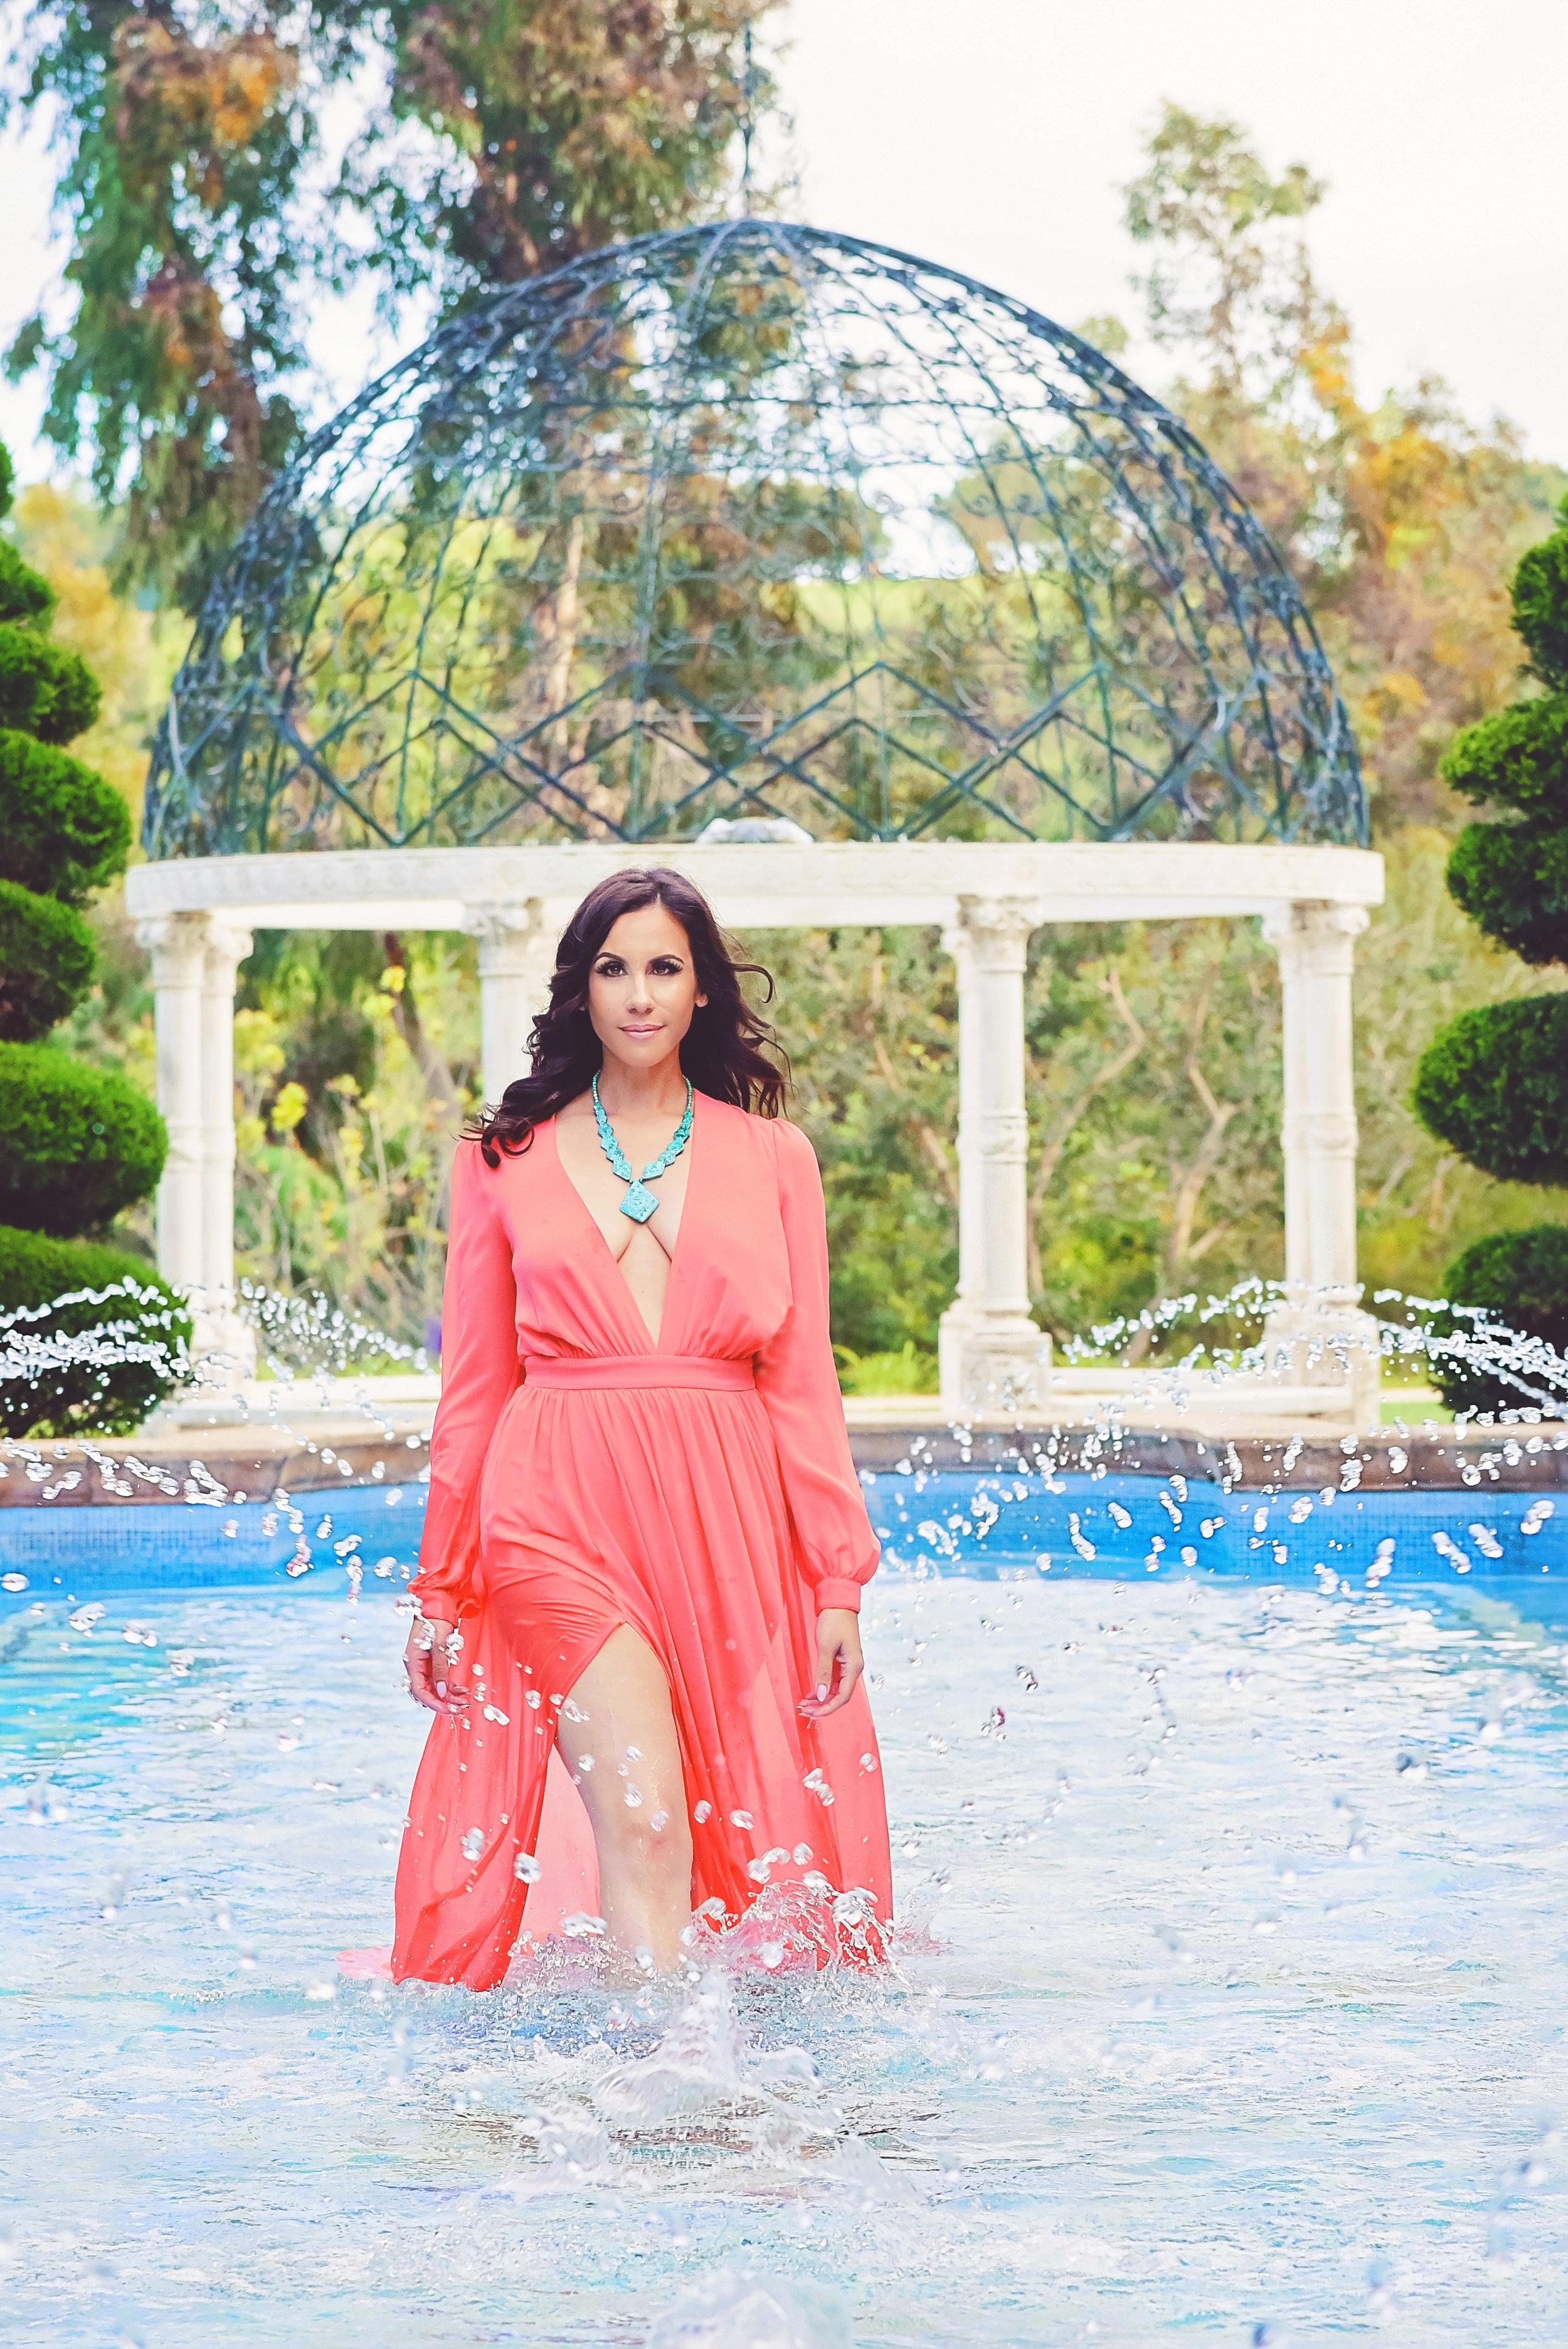 Fashion Aqua Necklace Coral Dress | Fashion Photography | Lacey O